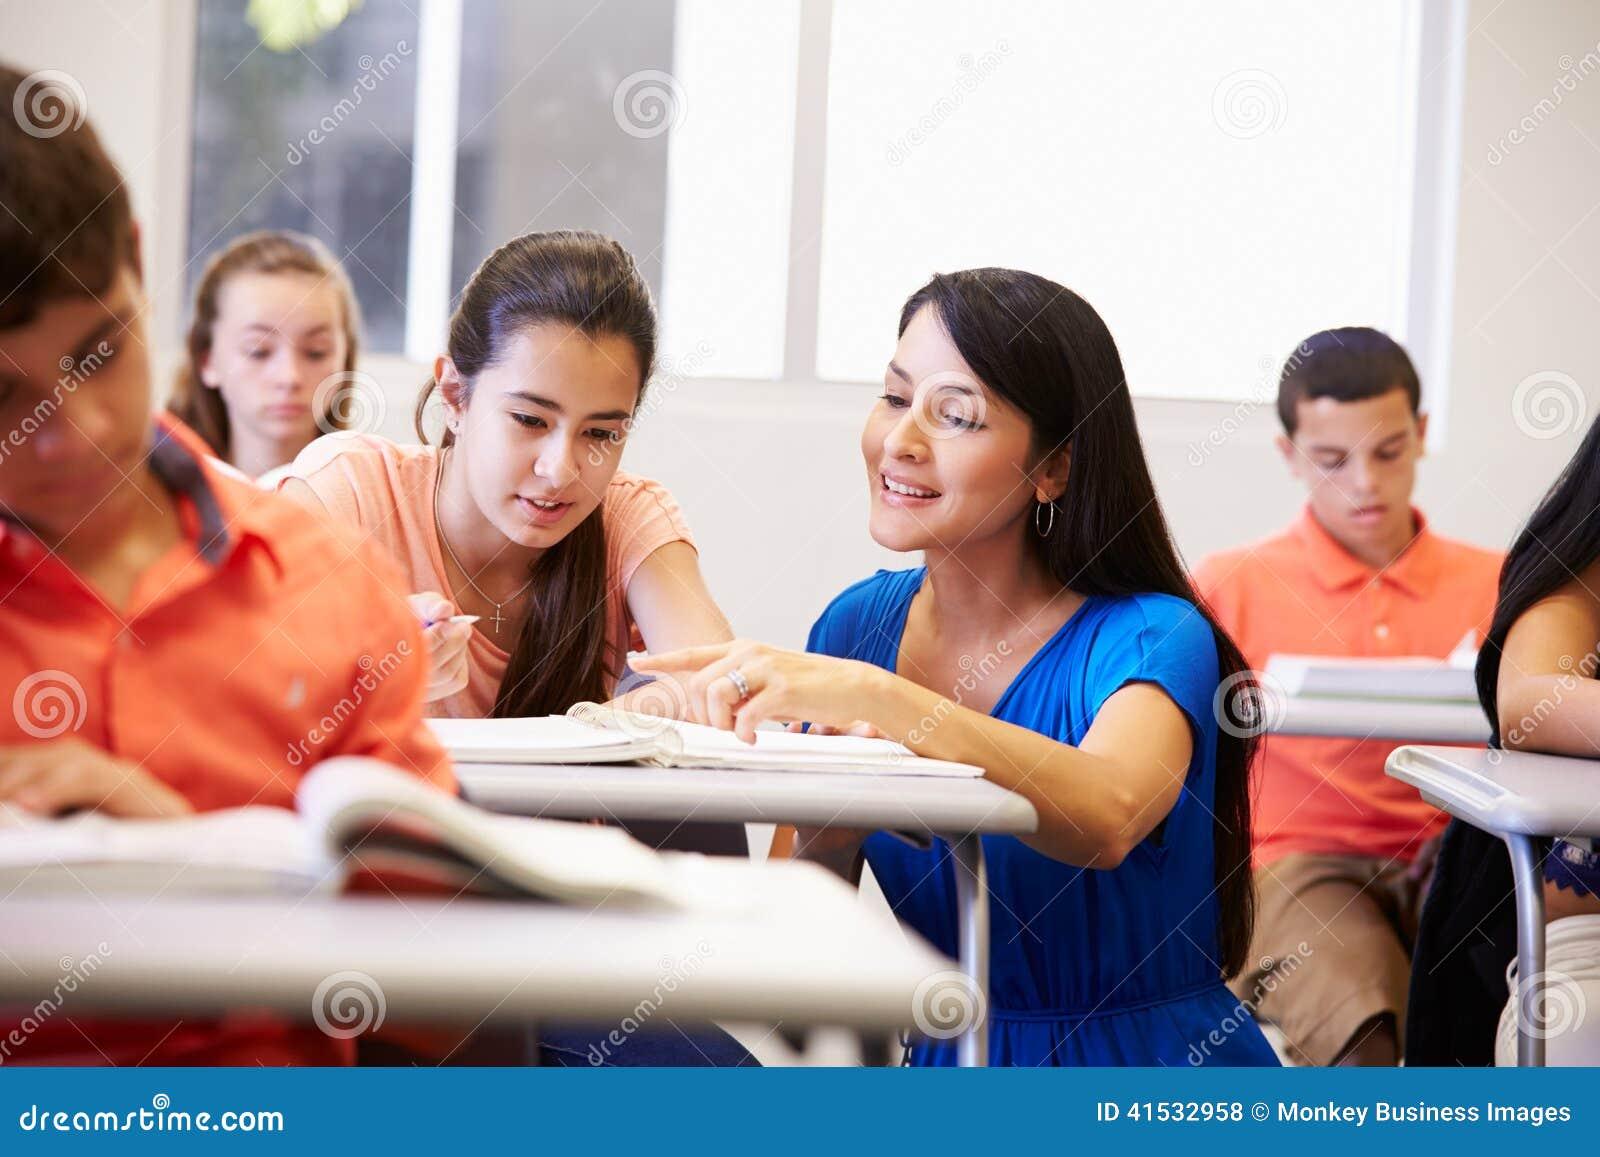 Teaching paraphrasing to high school students